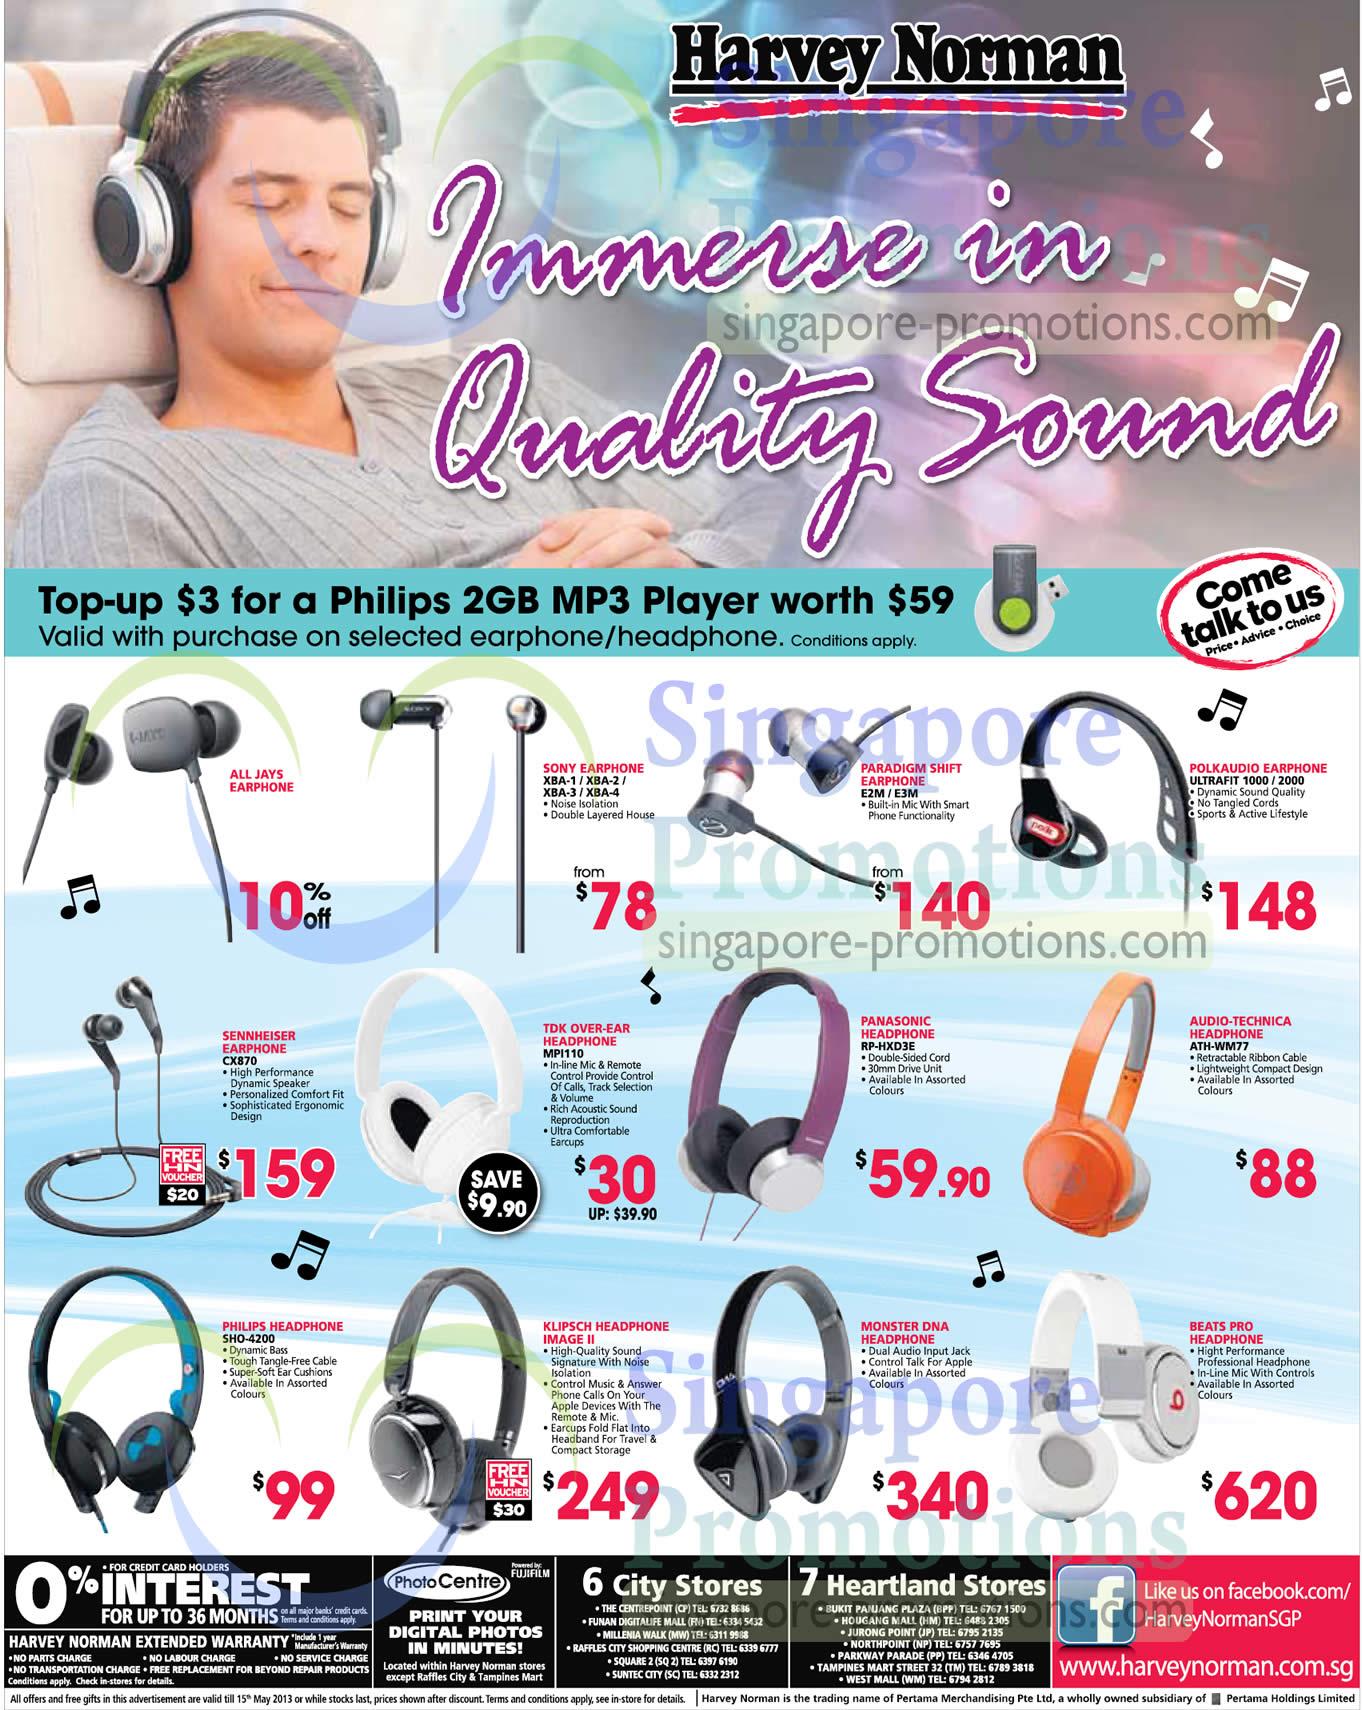 Harvey Norman Headphones 9 May 2013